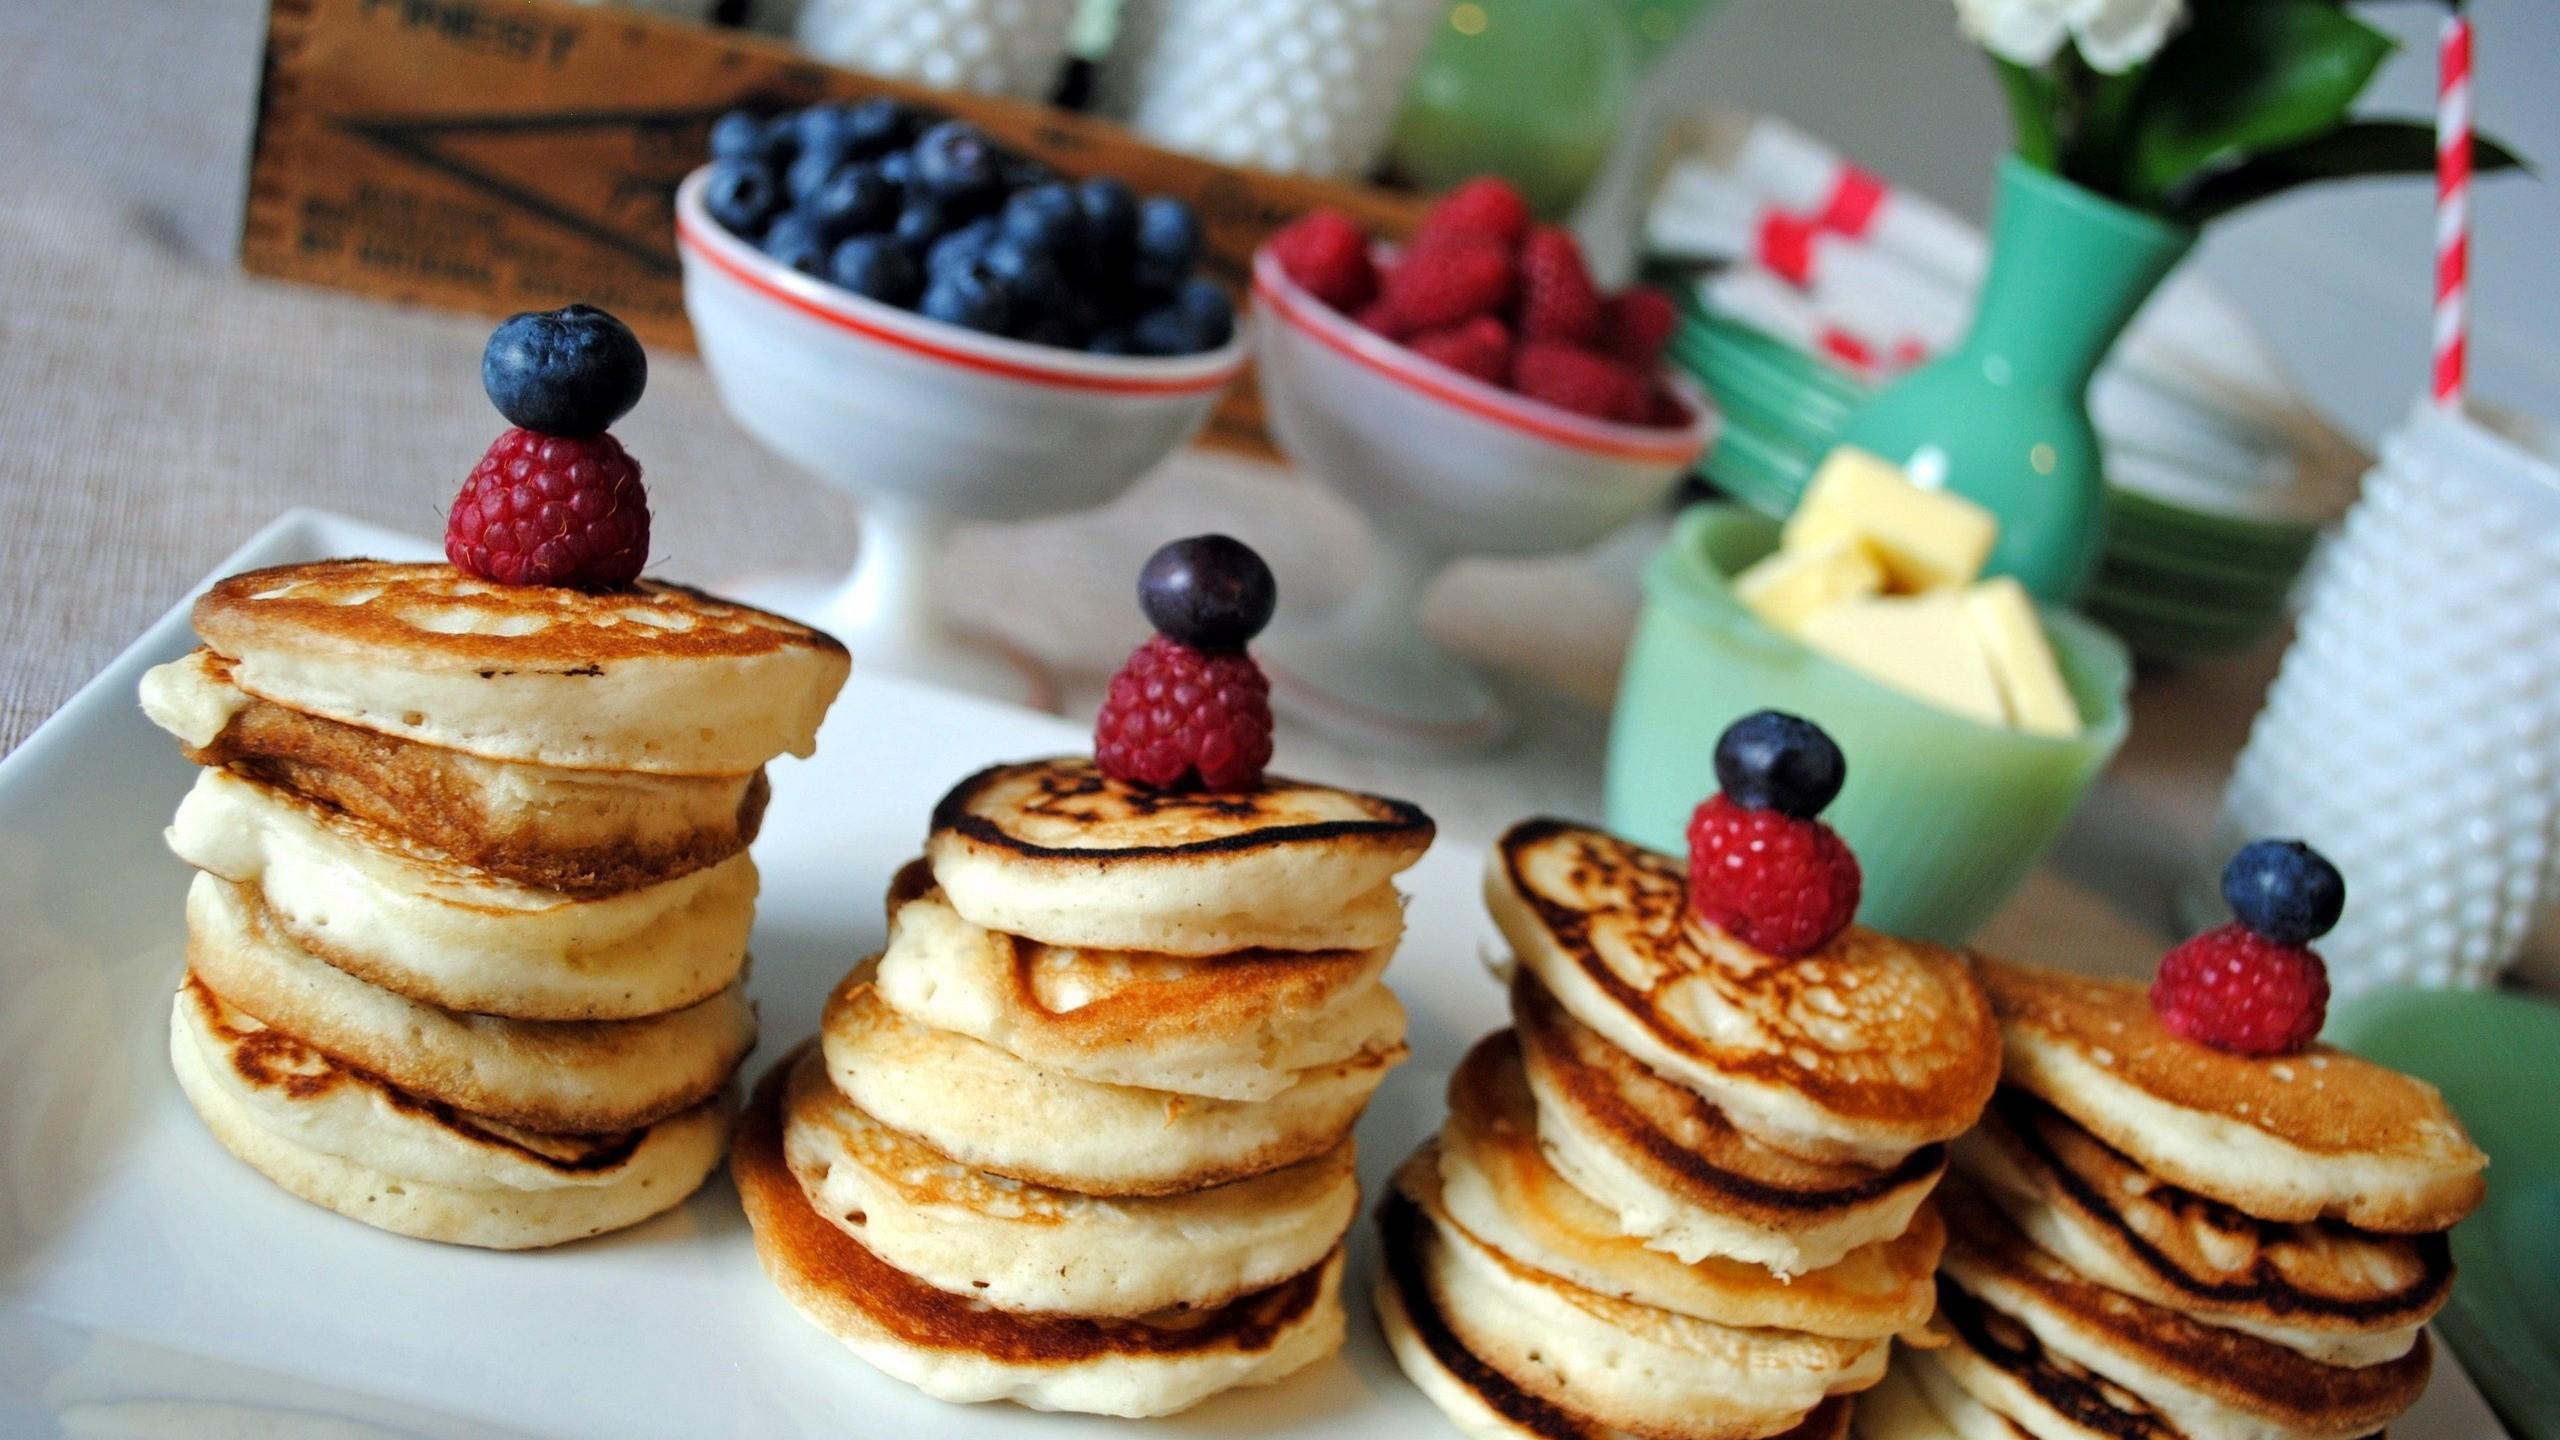 Pancake wallpaper hd